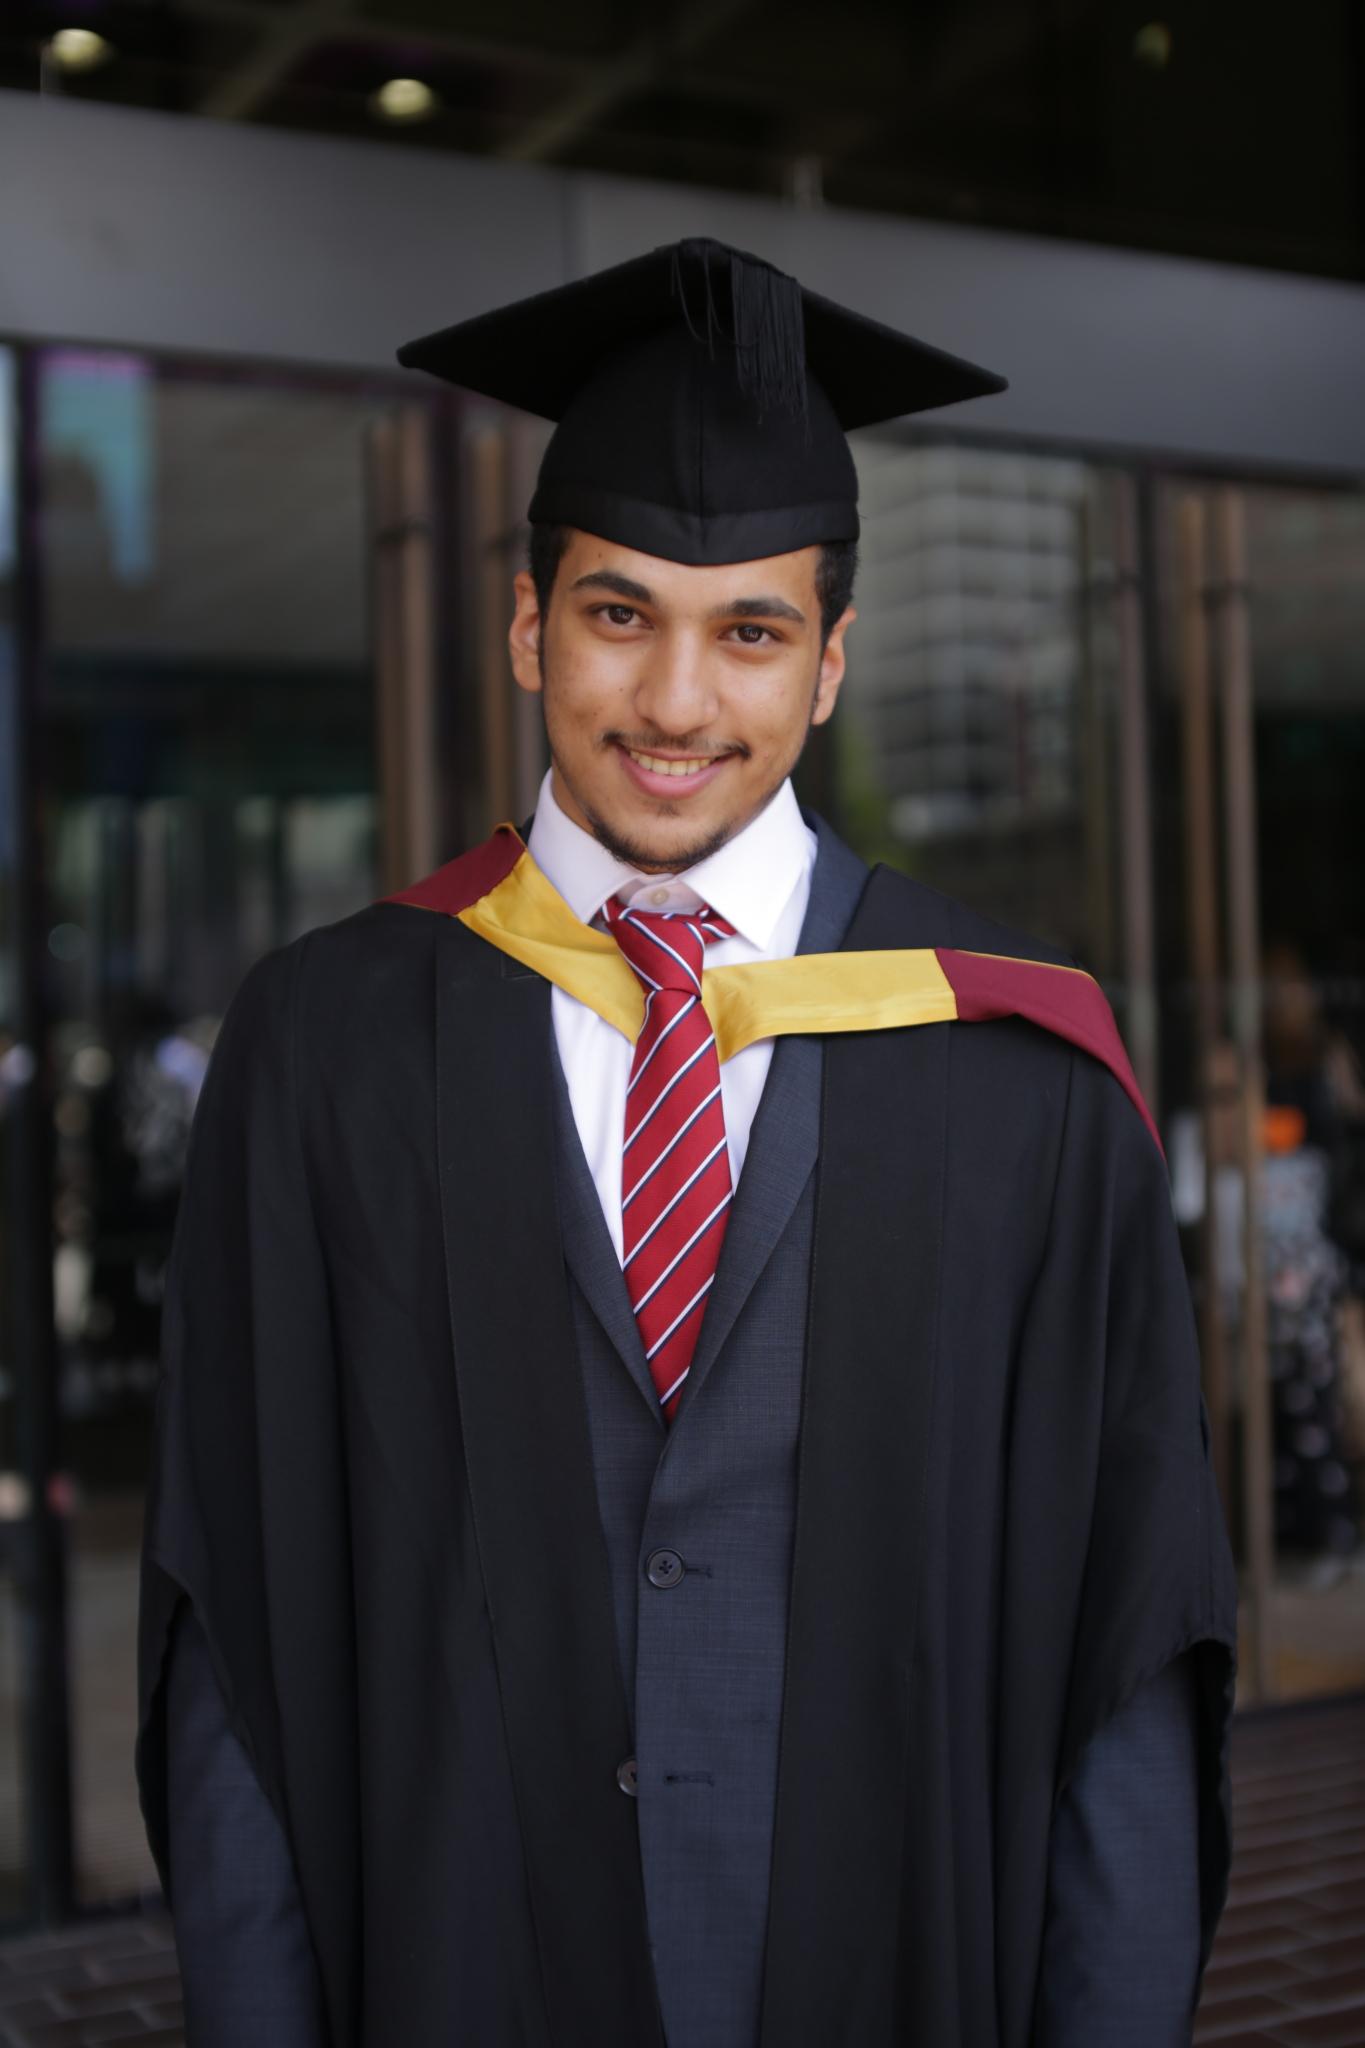 Ahmed Alabdali Graduating from City University London